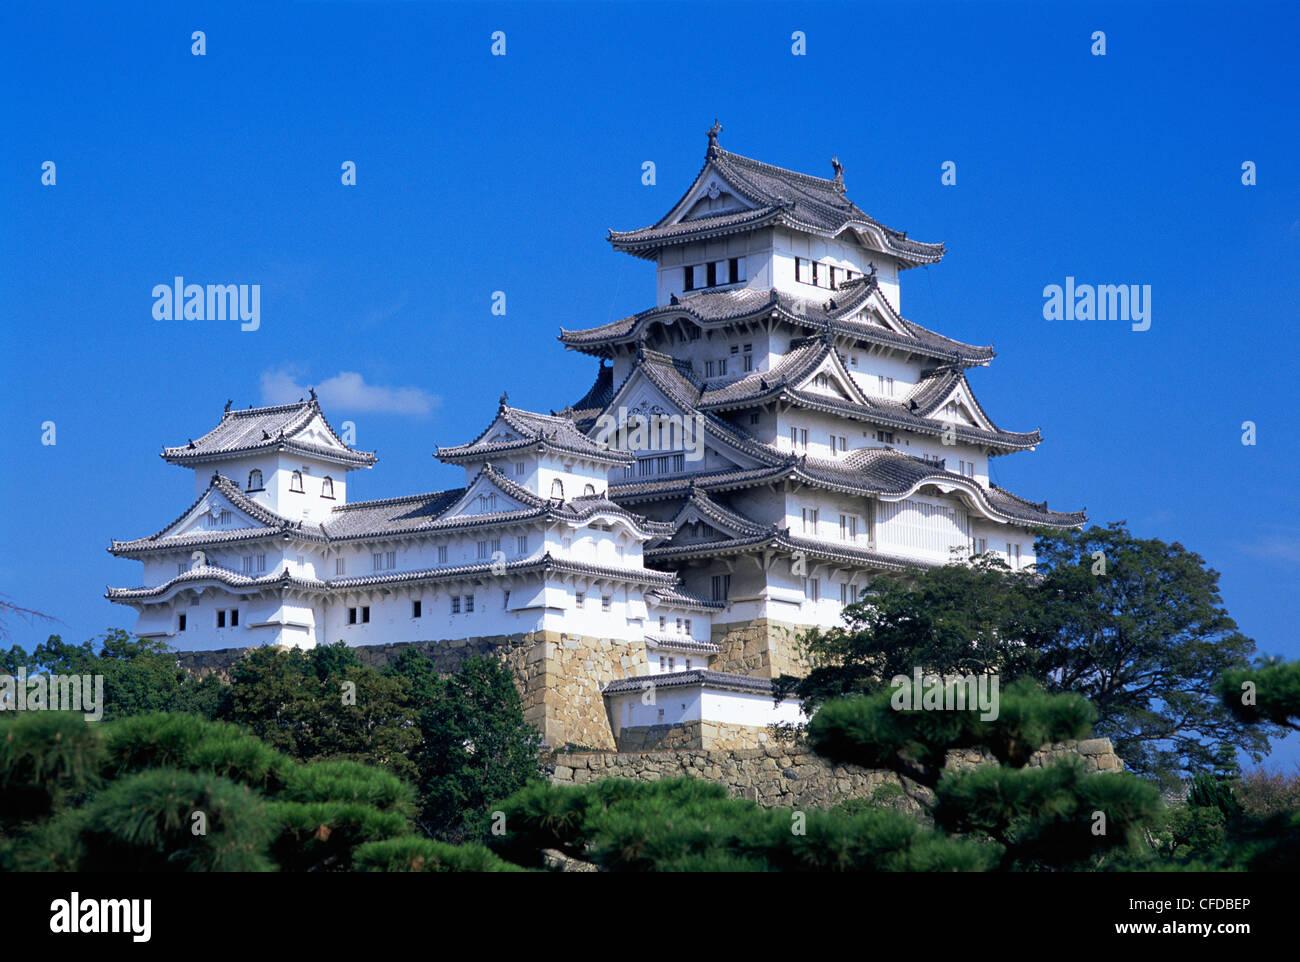 Japón, Honshu, Himeji, el Castillo de Himeji Imagen De Stock